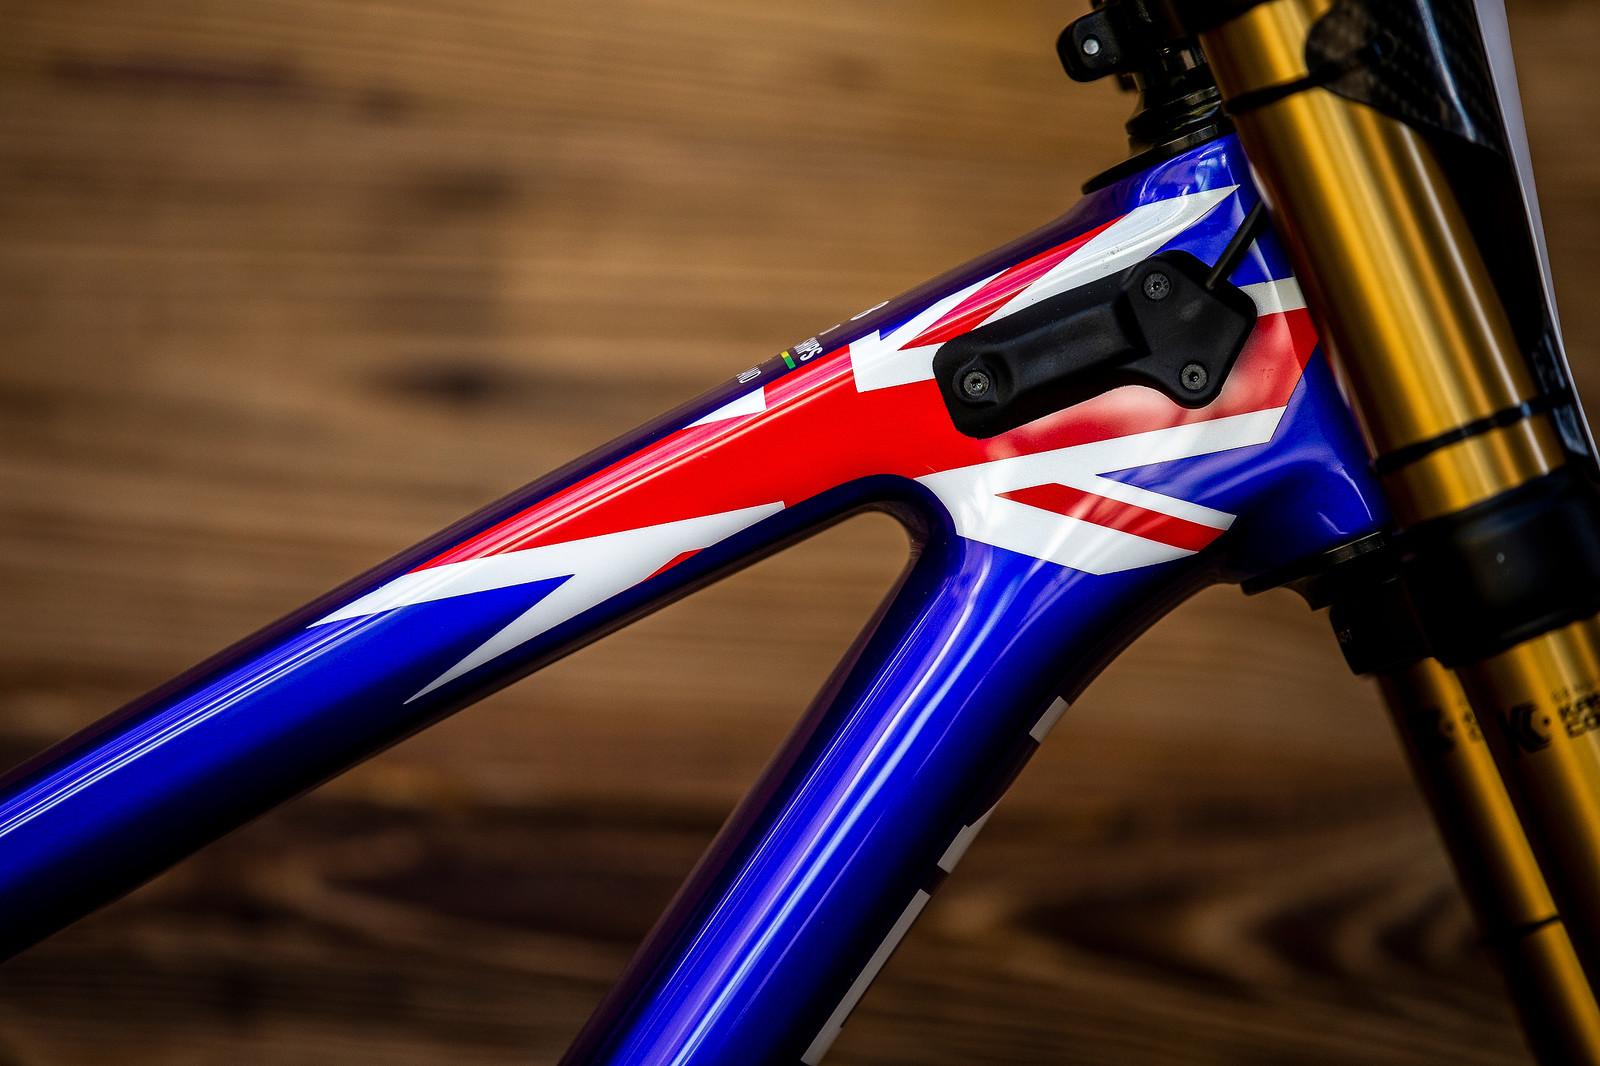 Union Jack - WORLD CHAMPS BIKE - Matt Walker's Saracen Myst - Mountain Biking Pictures - Vital MTB